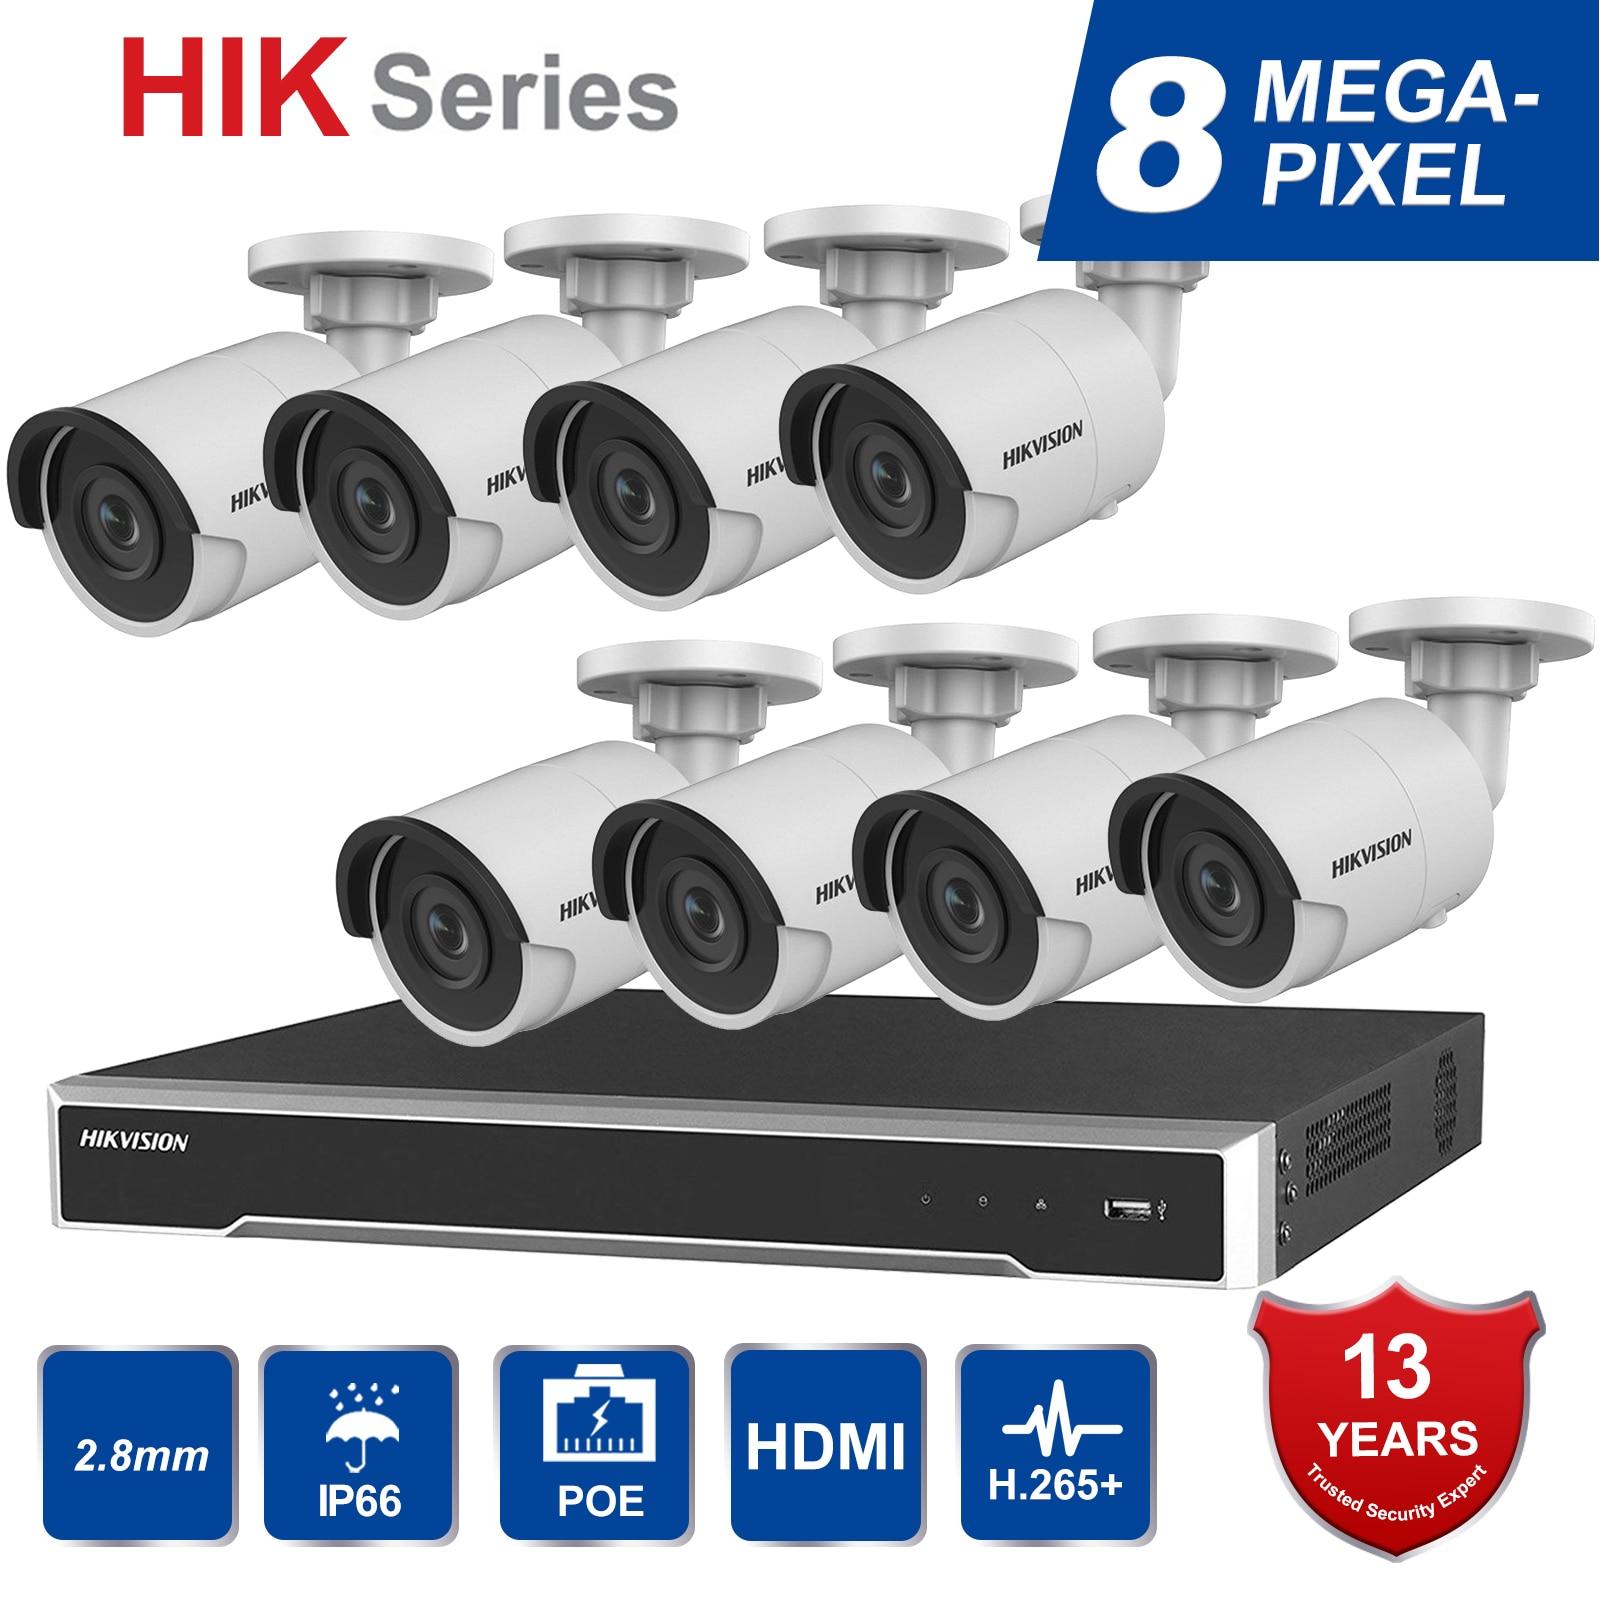 Hik Original 8CH HD เครือข่าย POE NVR ชุดกล้องวงจรปิดความปลอดภัย 8 pcs 8MP Bullet กล้อง IP กลางแจ้ง IR Night vision ชุด-ใน ระบบการเฝ้าระวัง จาก การรักษาความปลอดภัยและการป้องกัน บน AliExpress - 11.11_สิบเอ็ด สิบเอ็ดวันคนโสด 1